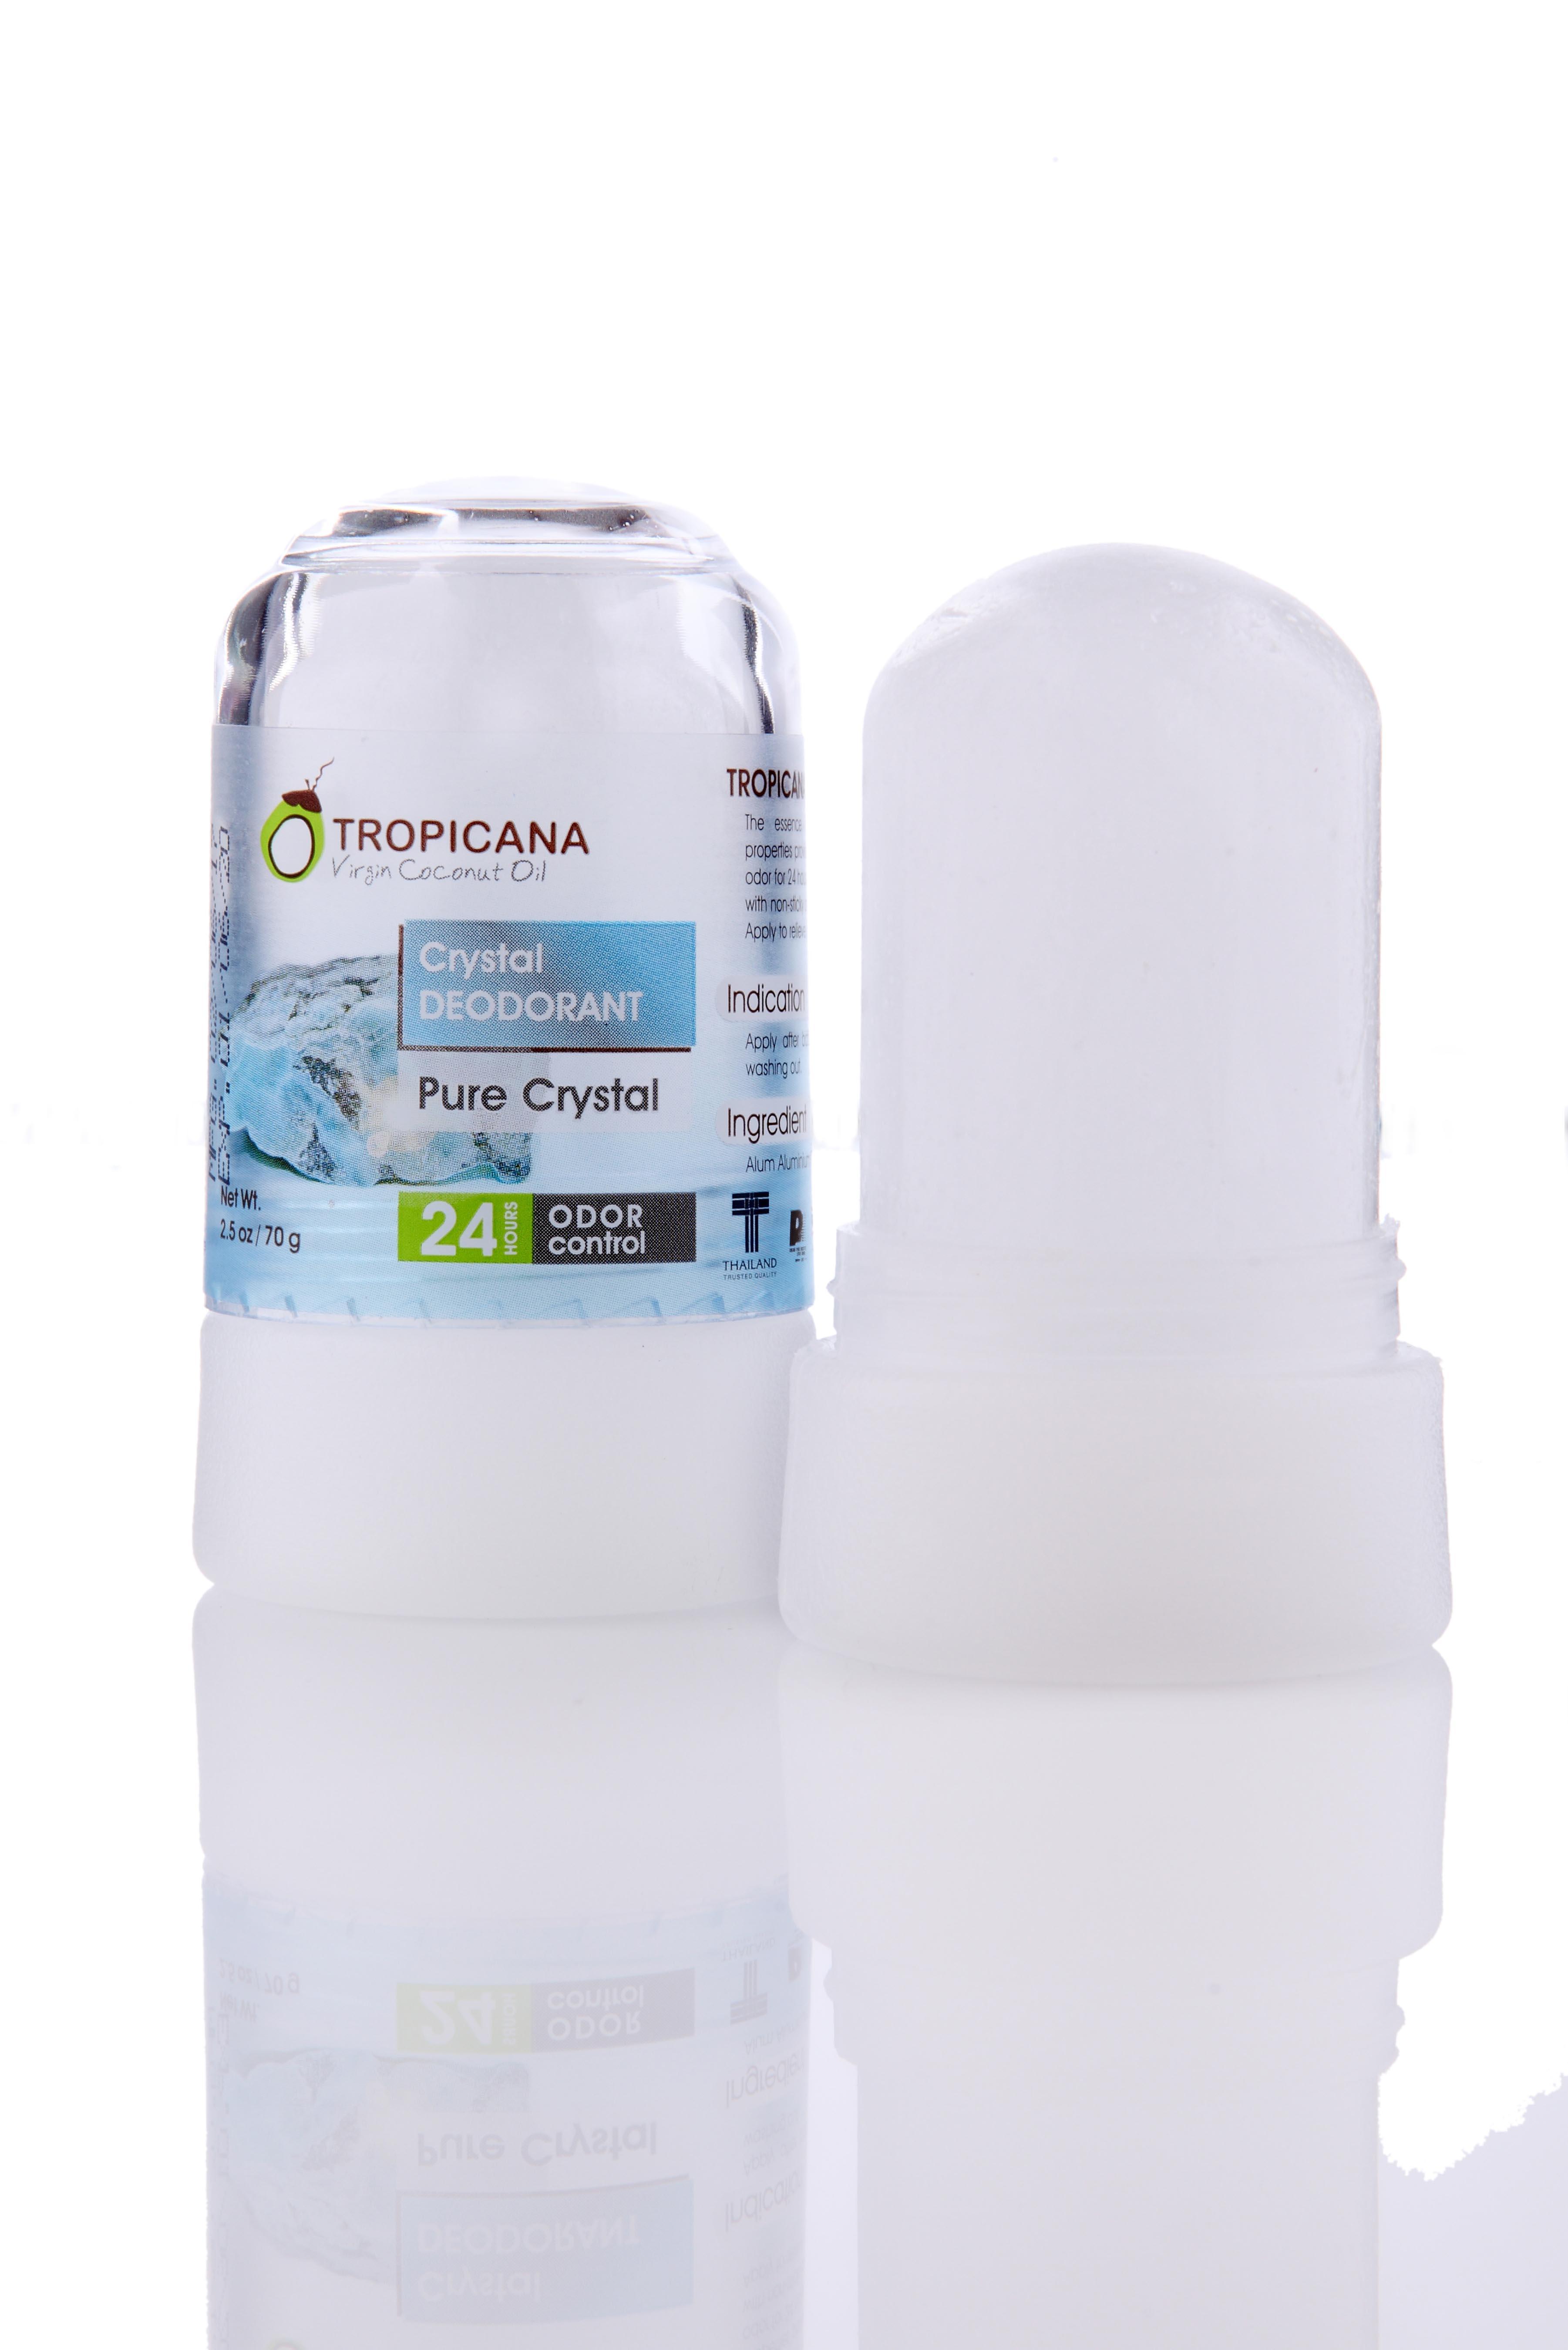 Натуральный дезодорант кристалл Tropicana \'Чистый кристалл\', 70 гр